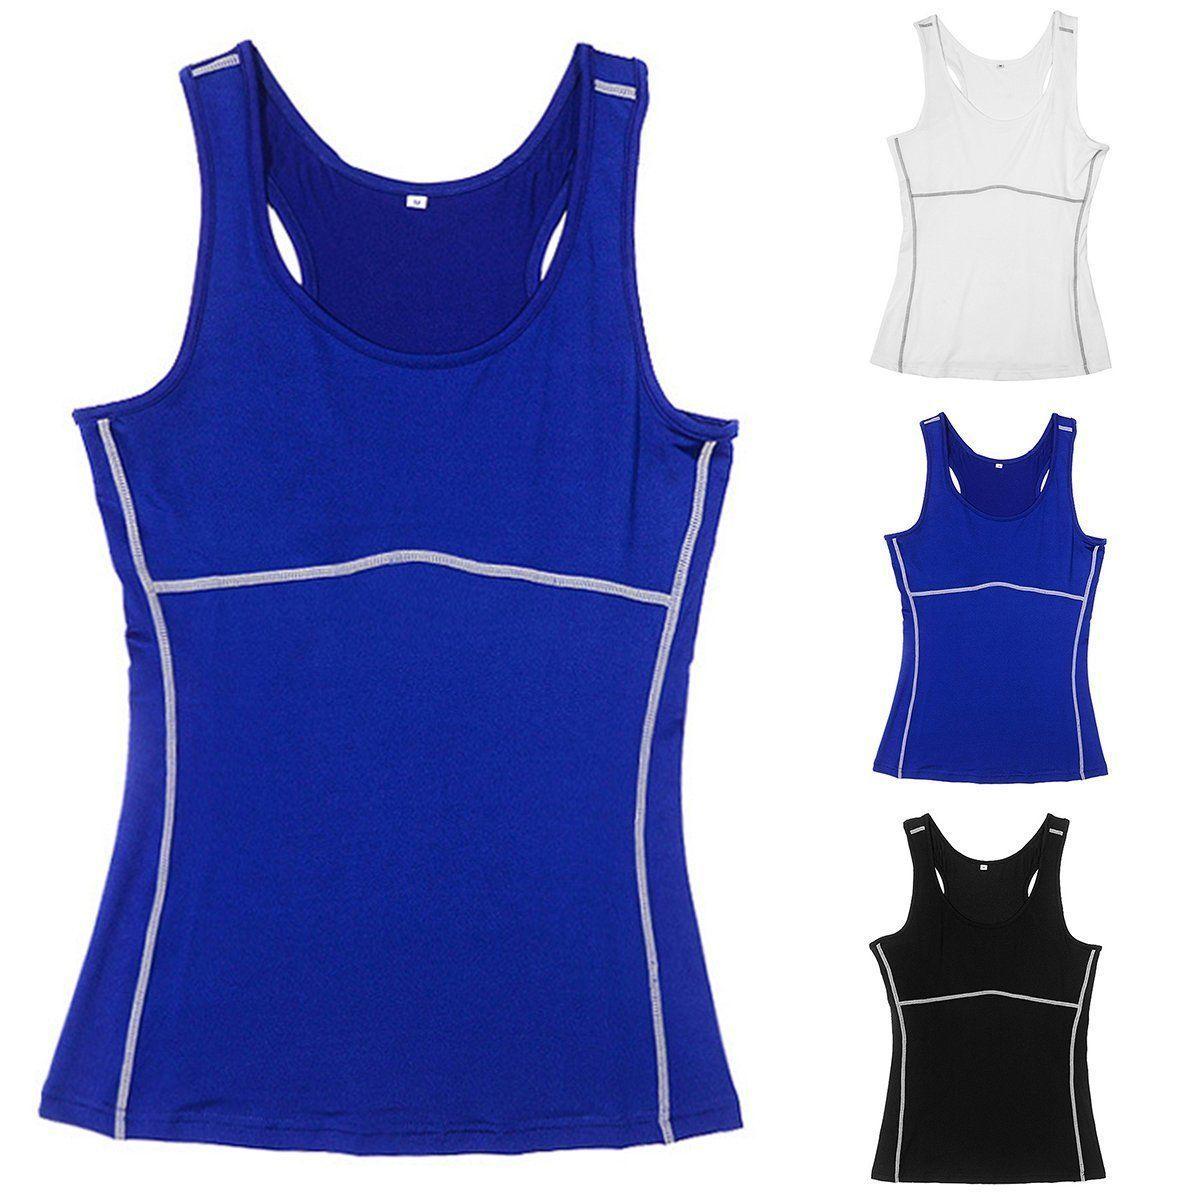 Women'S Soft Slimming Undershirt Vest Shaper Cami Body Shaper Shapewear Tank Top